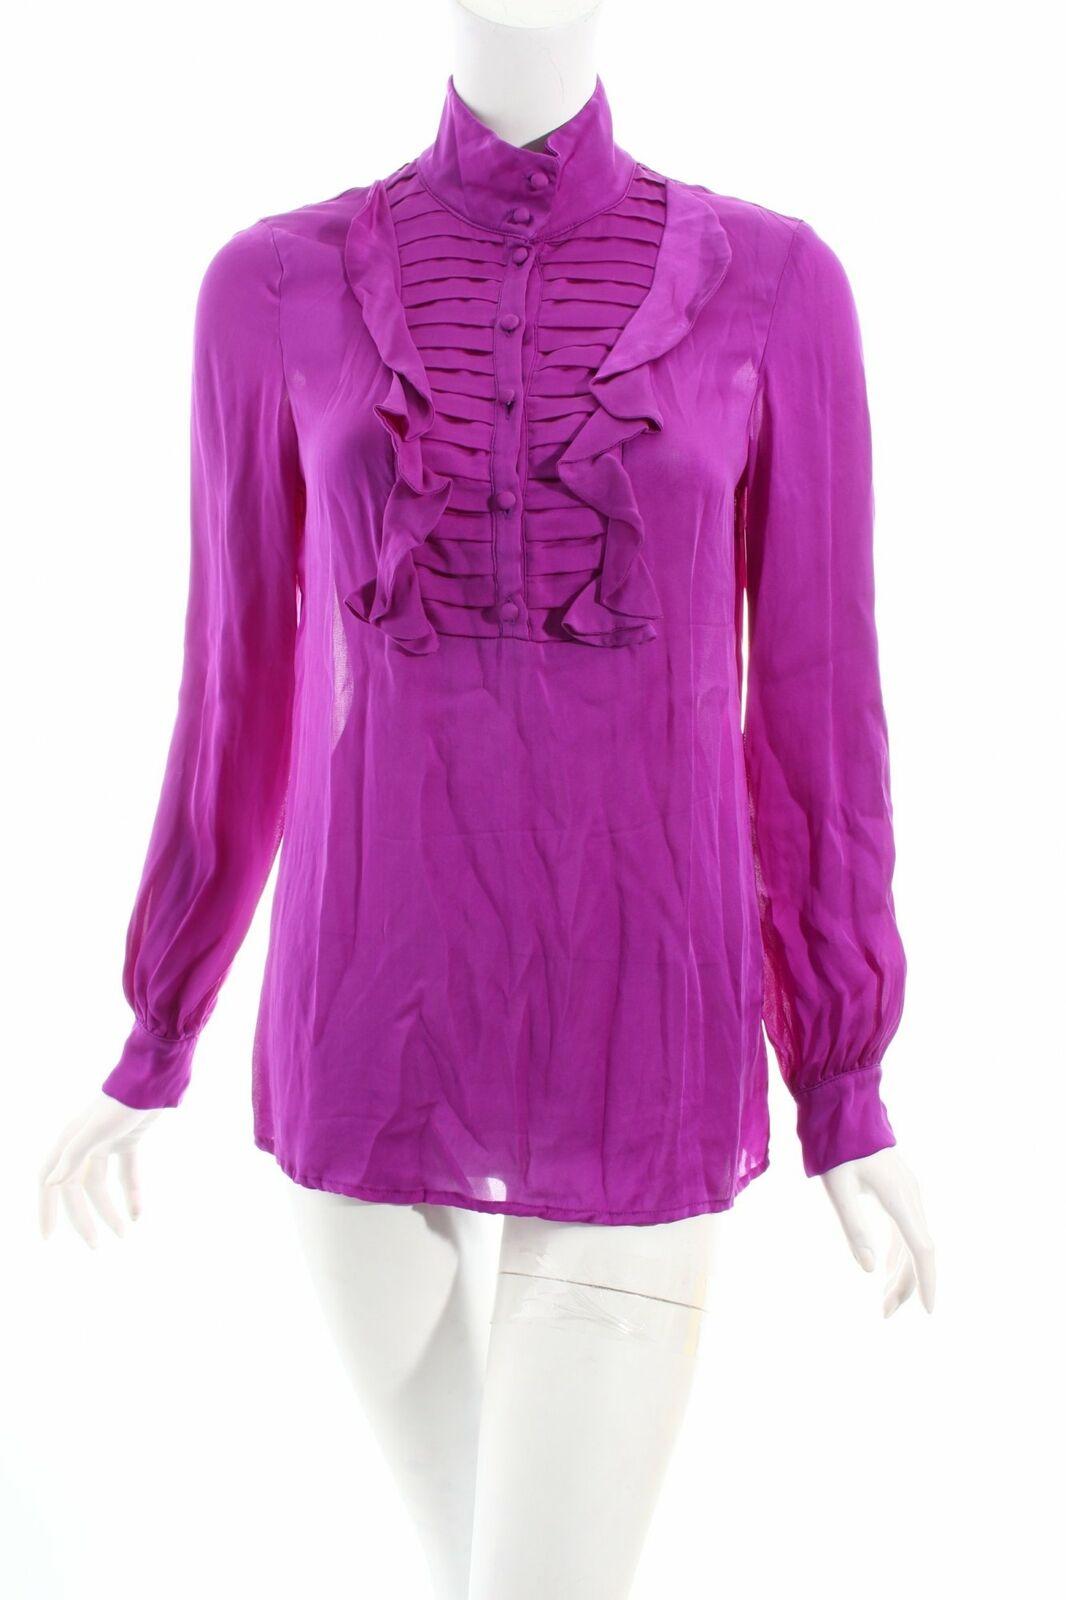 Reiss-Manica lunga Camicia Viola business-look da donna tg. de de de 38 seta BLOUSE 5c768f